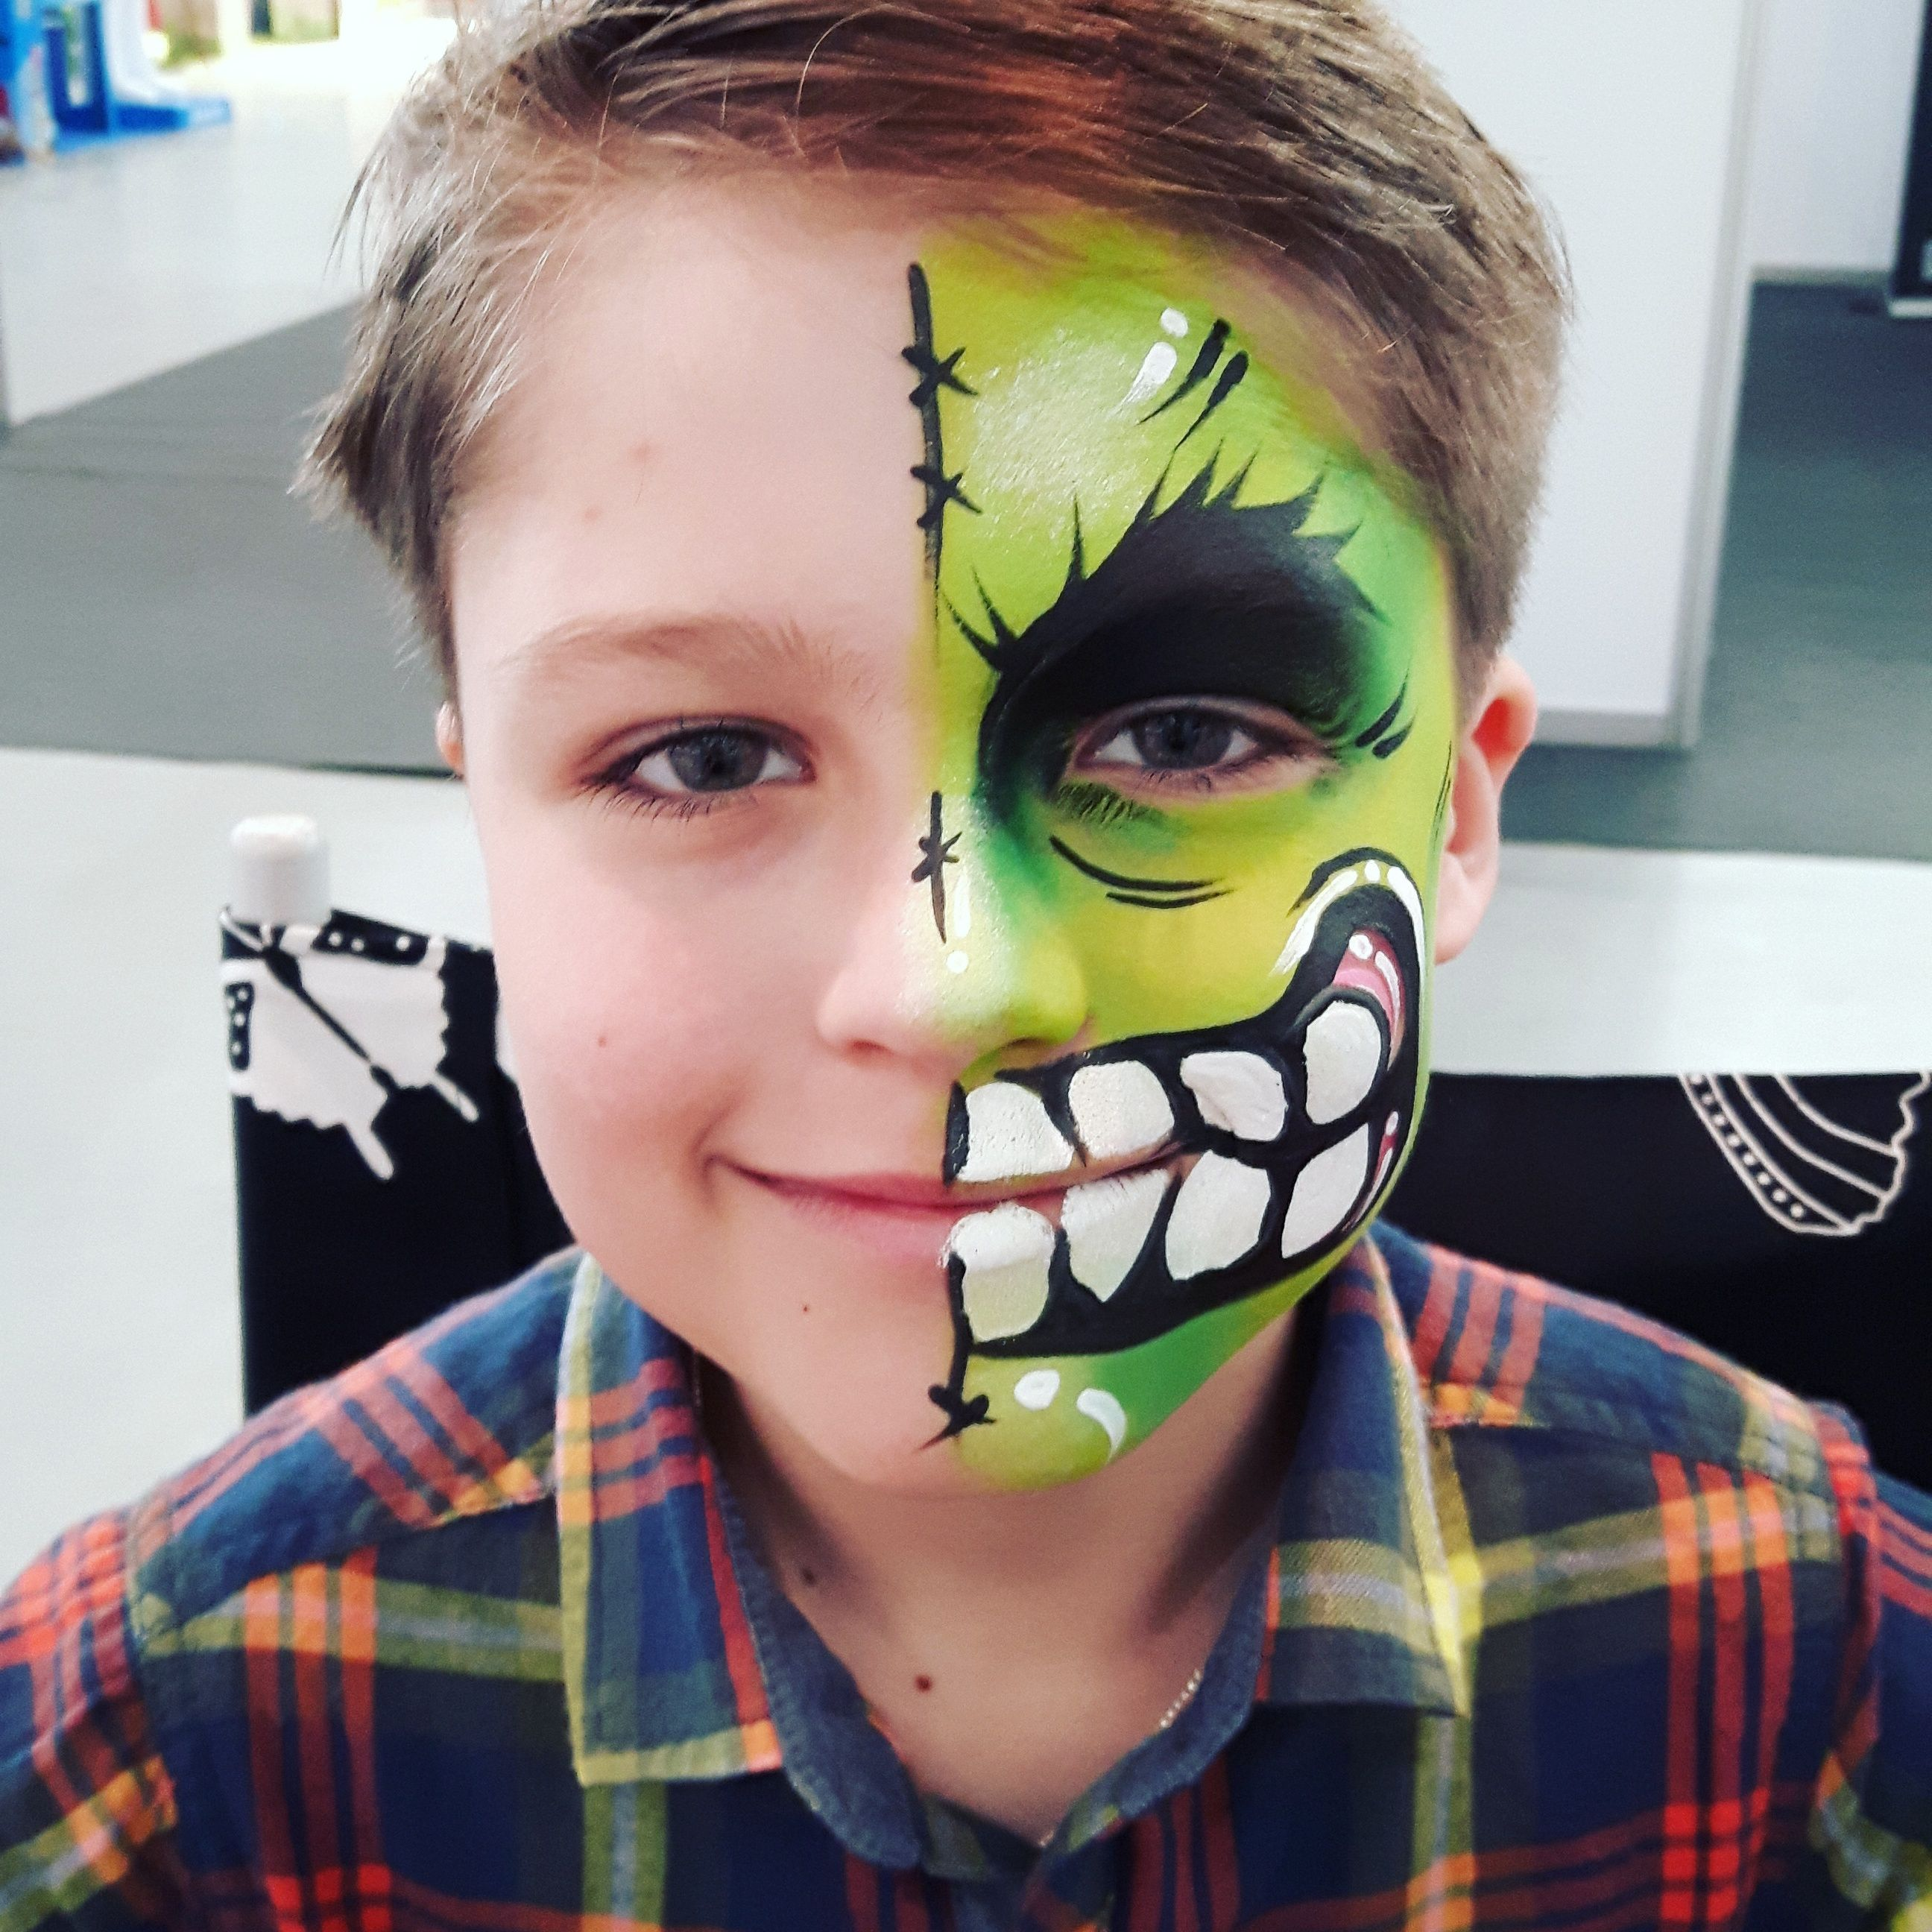 Schminktipps Halloween Kinder.Hulk Face Painting By Katarzyna Zielinska Kinder Schminken Halloween Schminken Kinder Gruselig Schminken